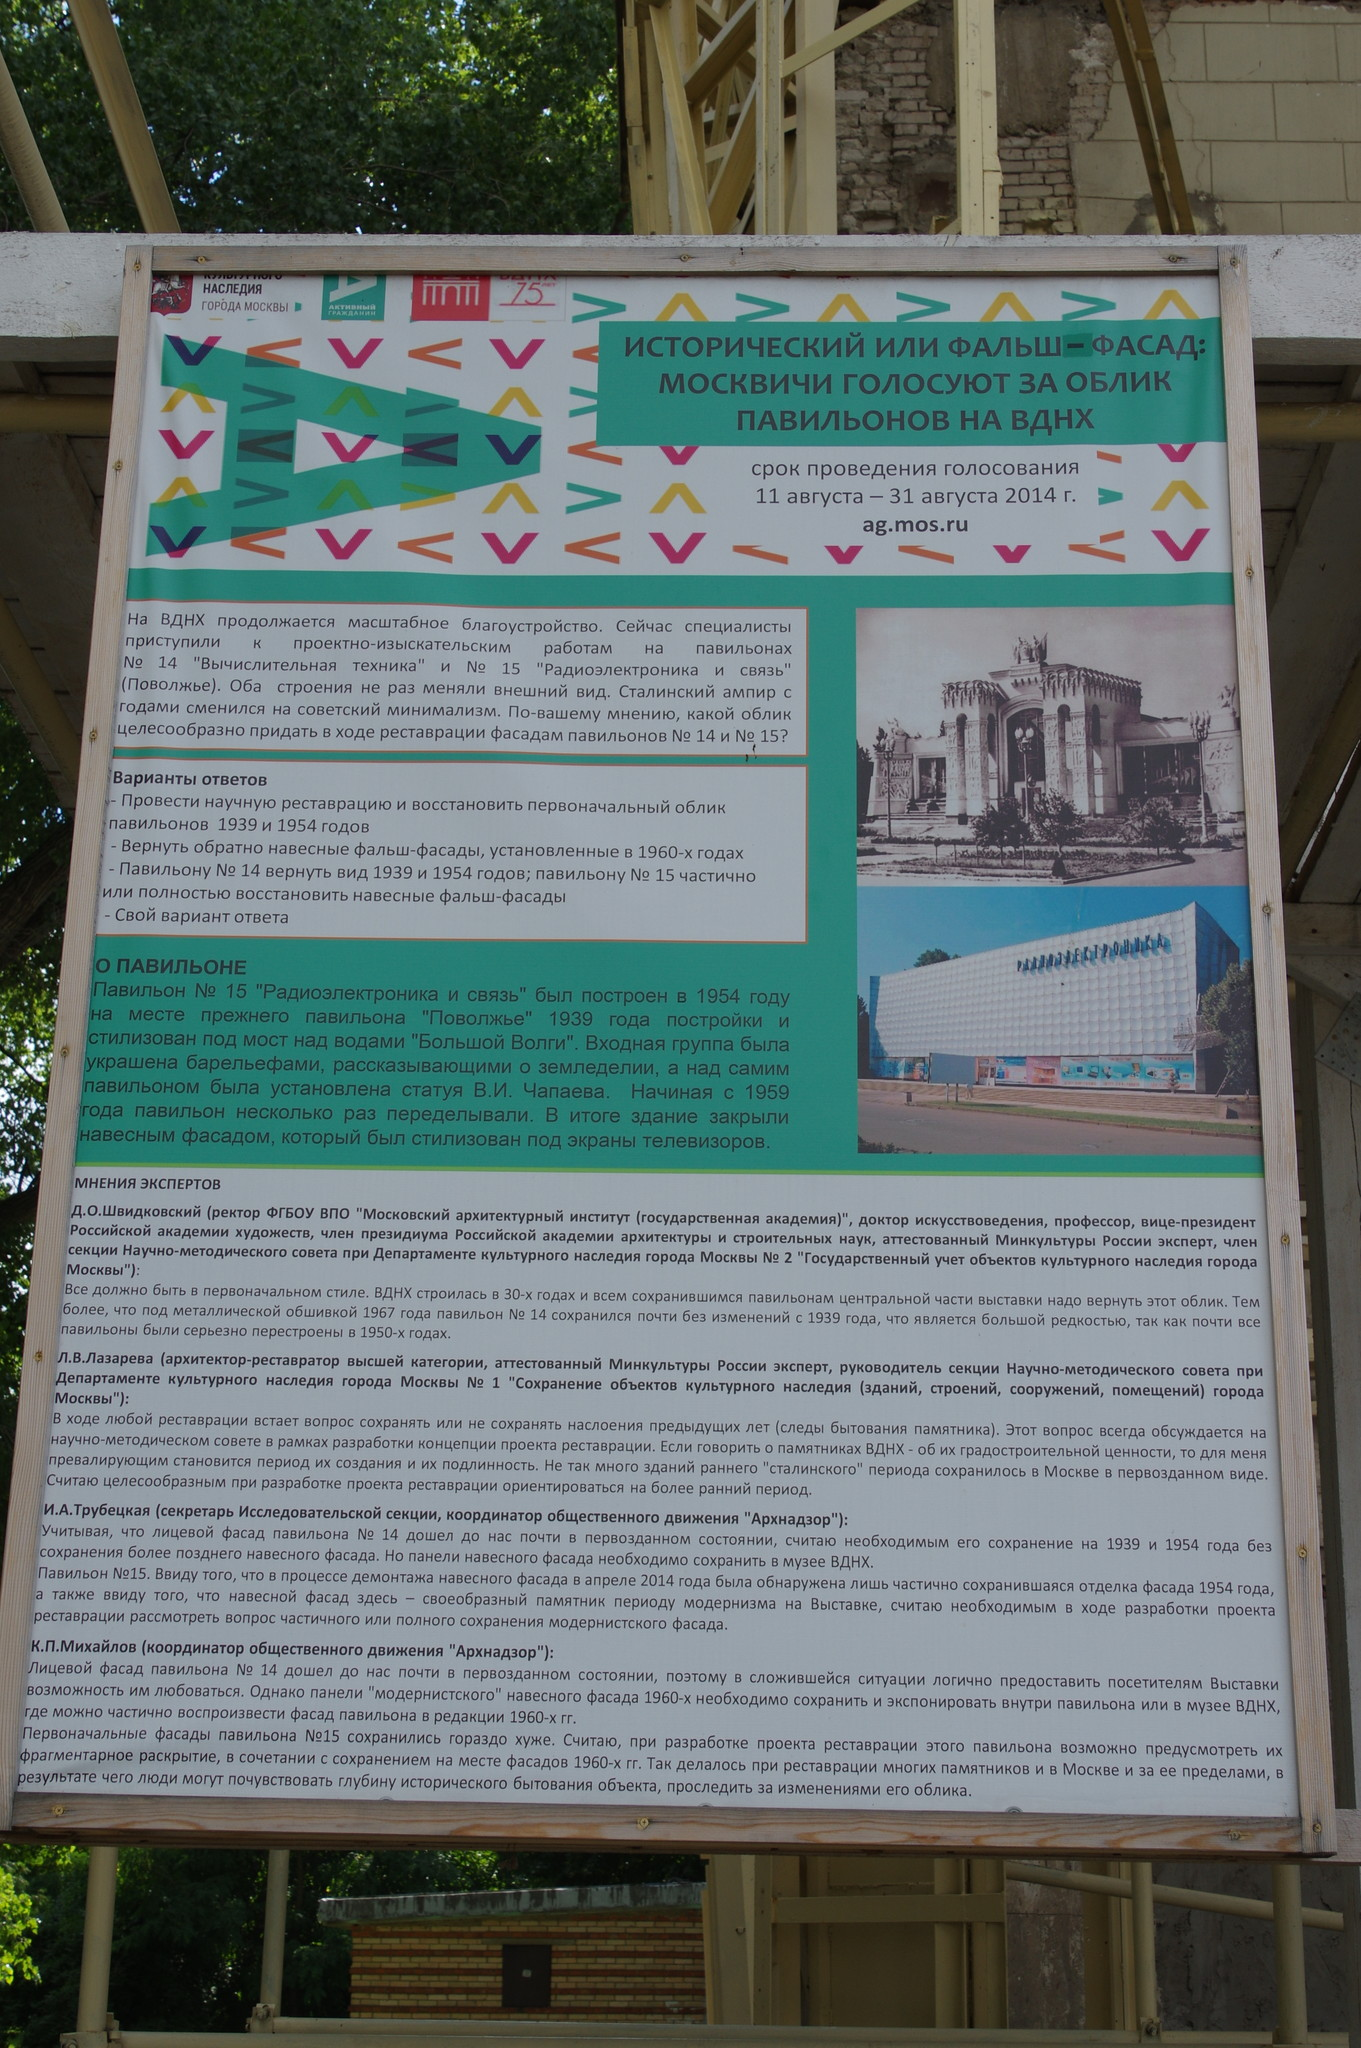 Павильон № 15 «Радиоэлектроника и связь» на ВДНХ